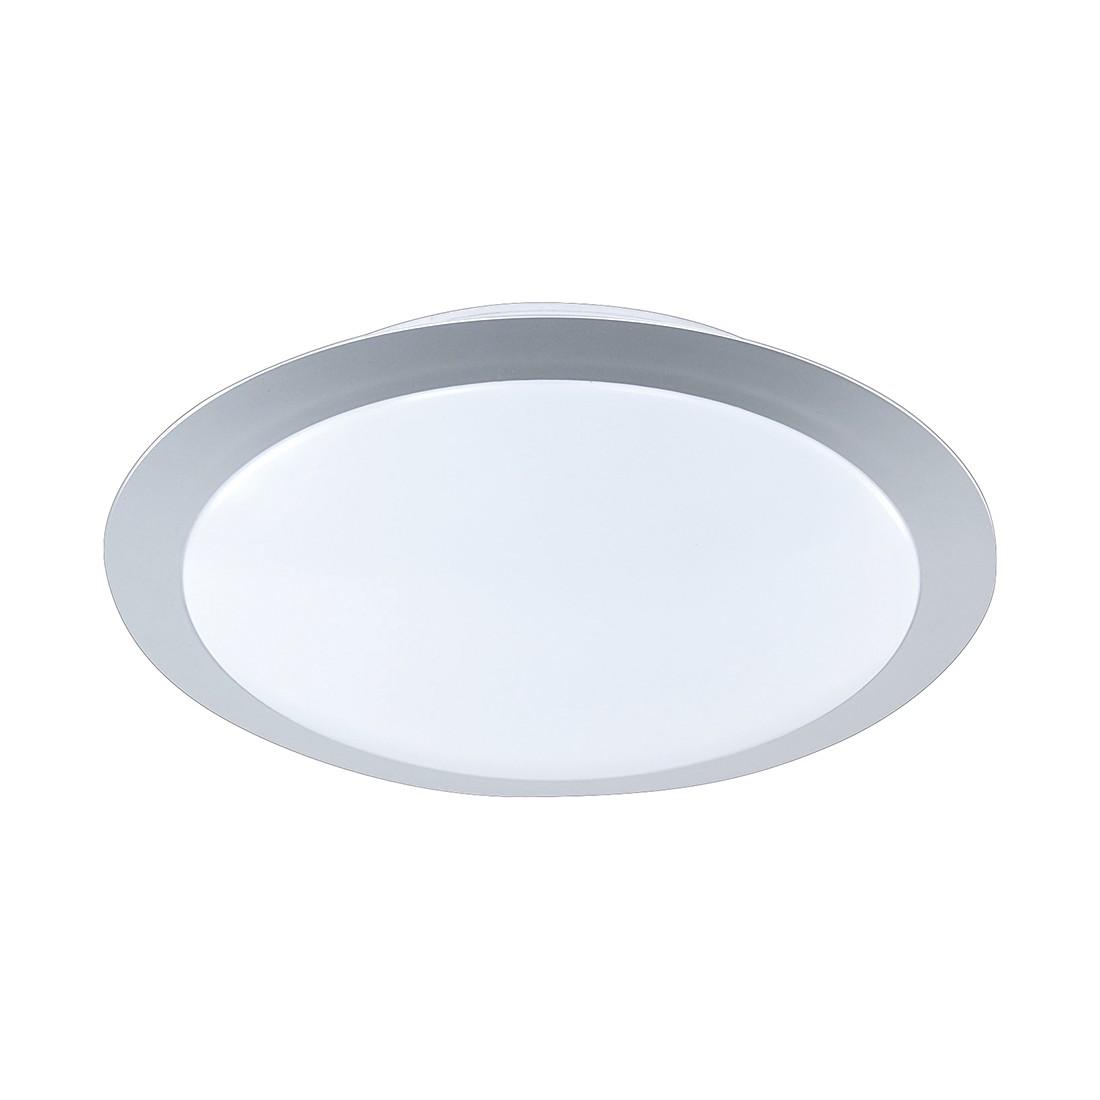 energie  A+, LED-plafondlamp - titaankleurig 1x9W, Trio